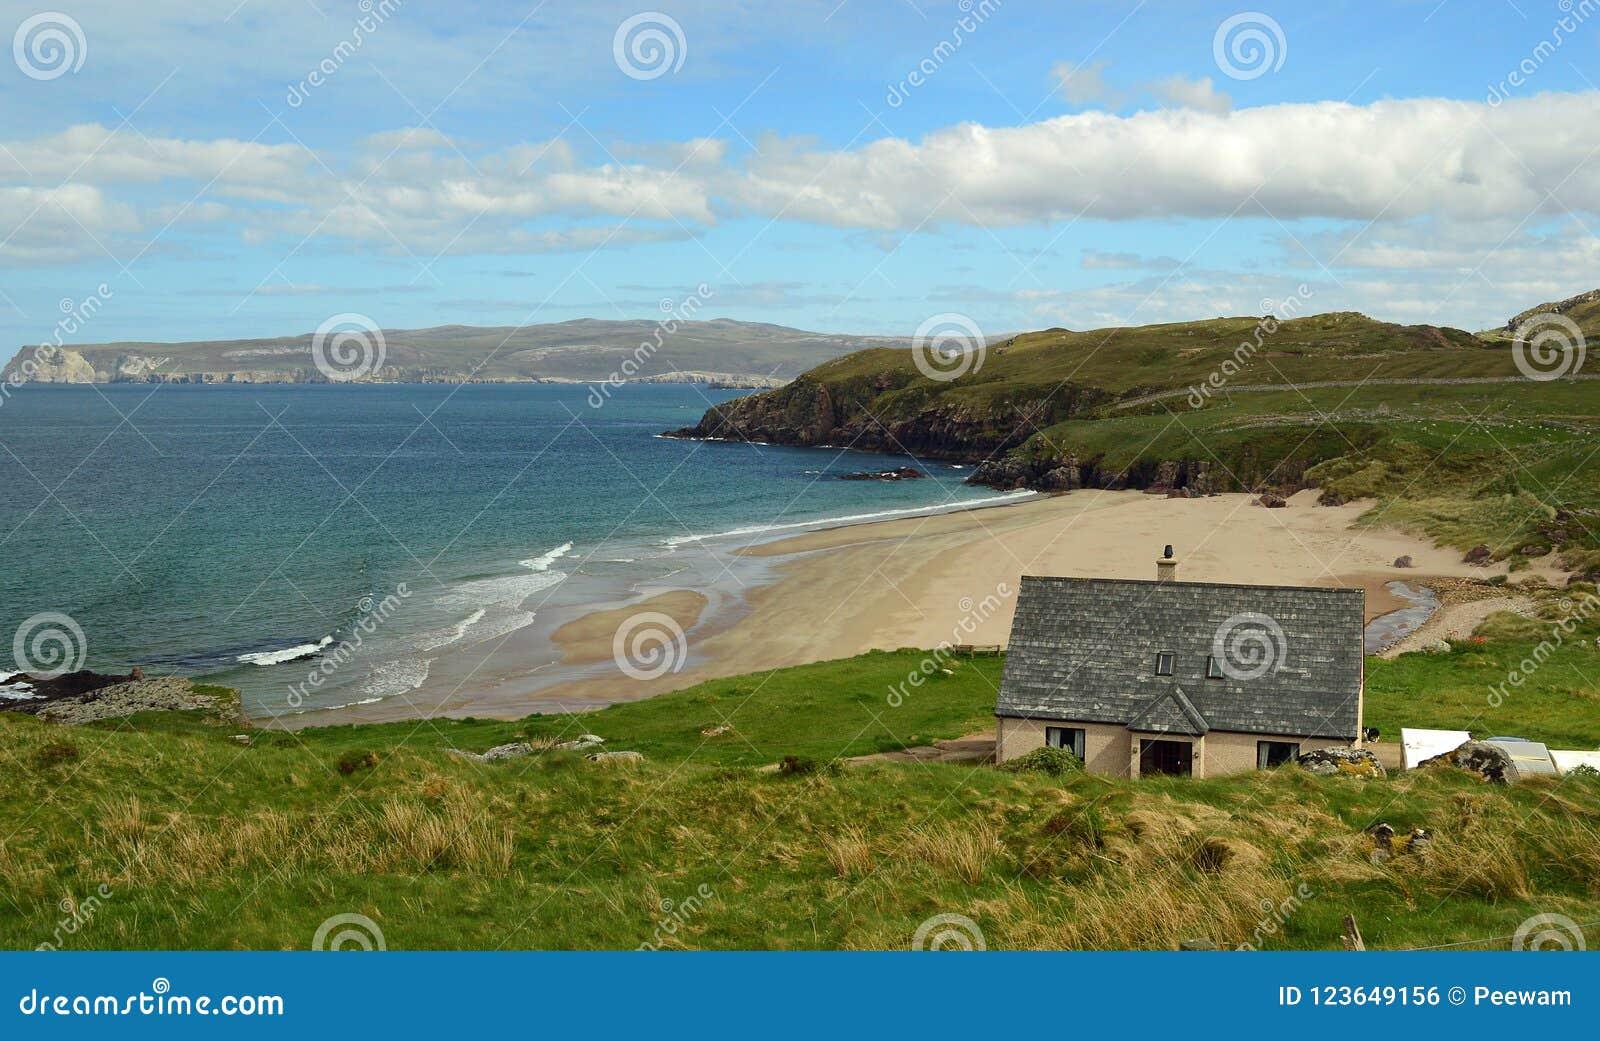 Sutherland beach on the North Coast 500, Scotland United Kingdom Europe